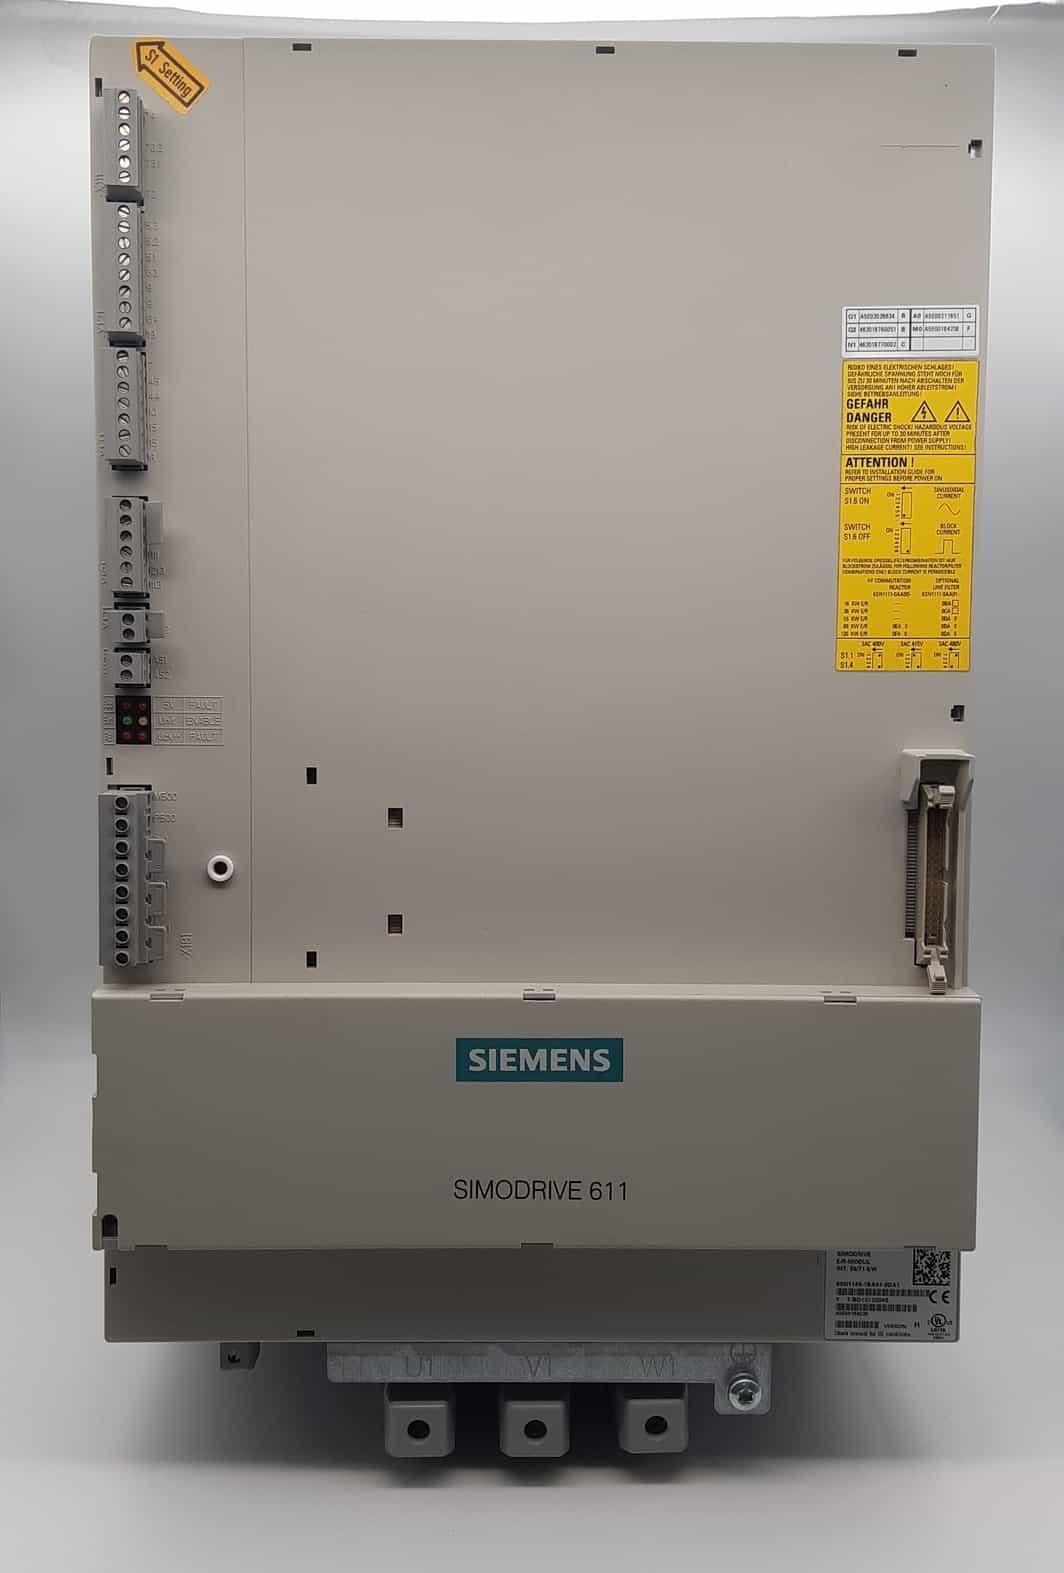 6SN1145-1BA01-0DA1 | FONTE SIMODRIVE 611 55/71 KW | SIEMENS